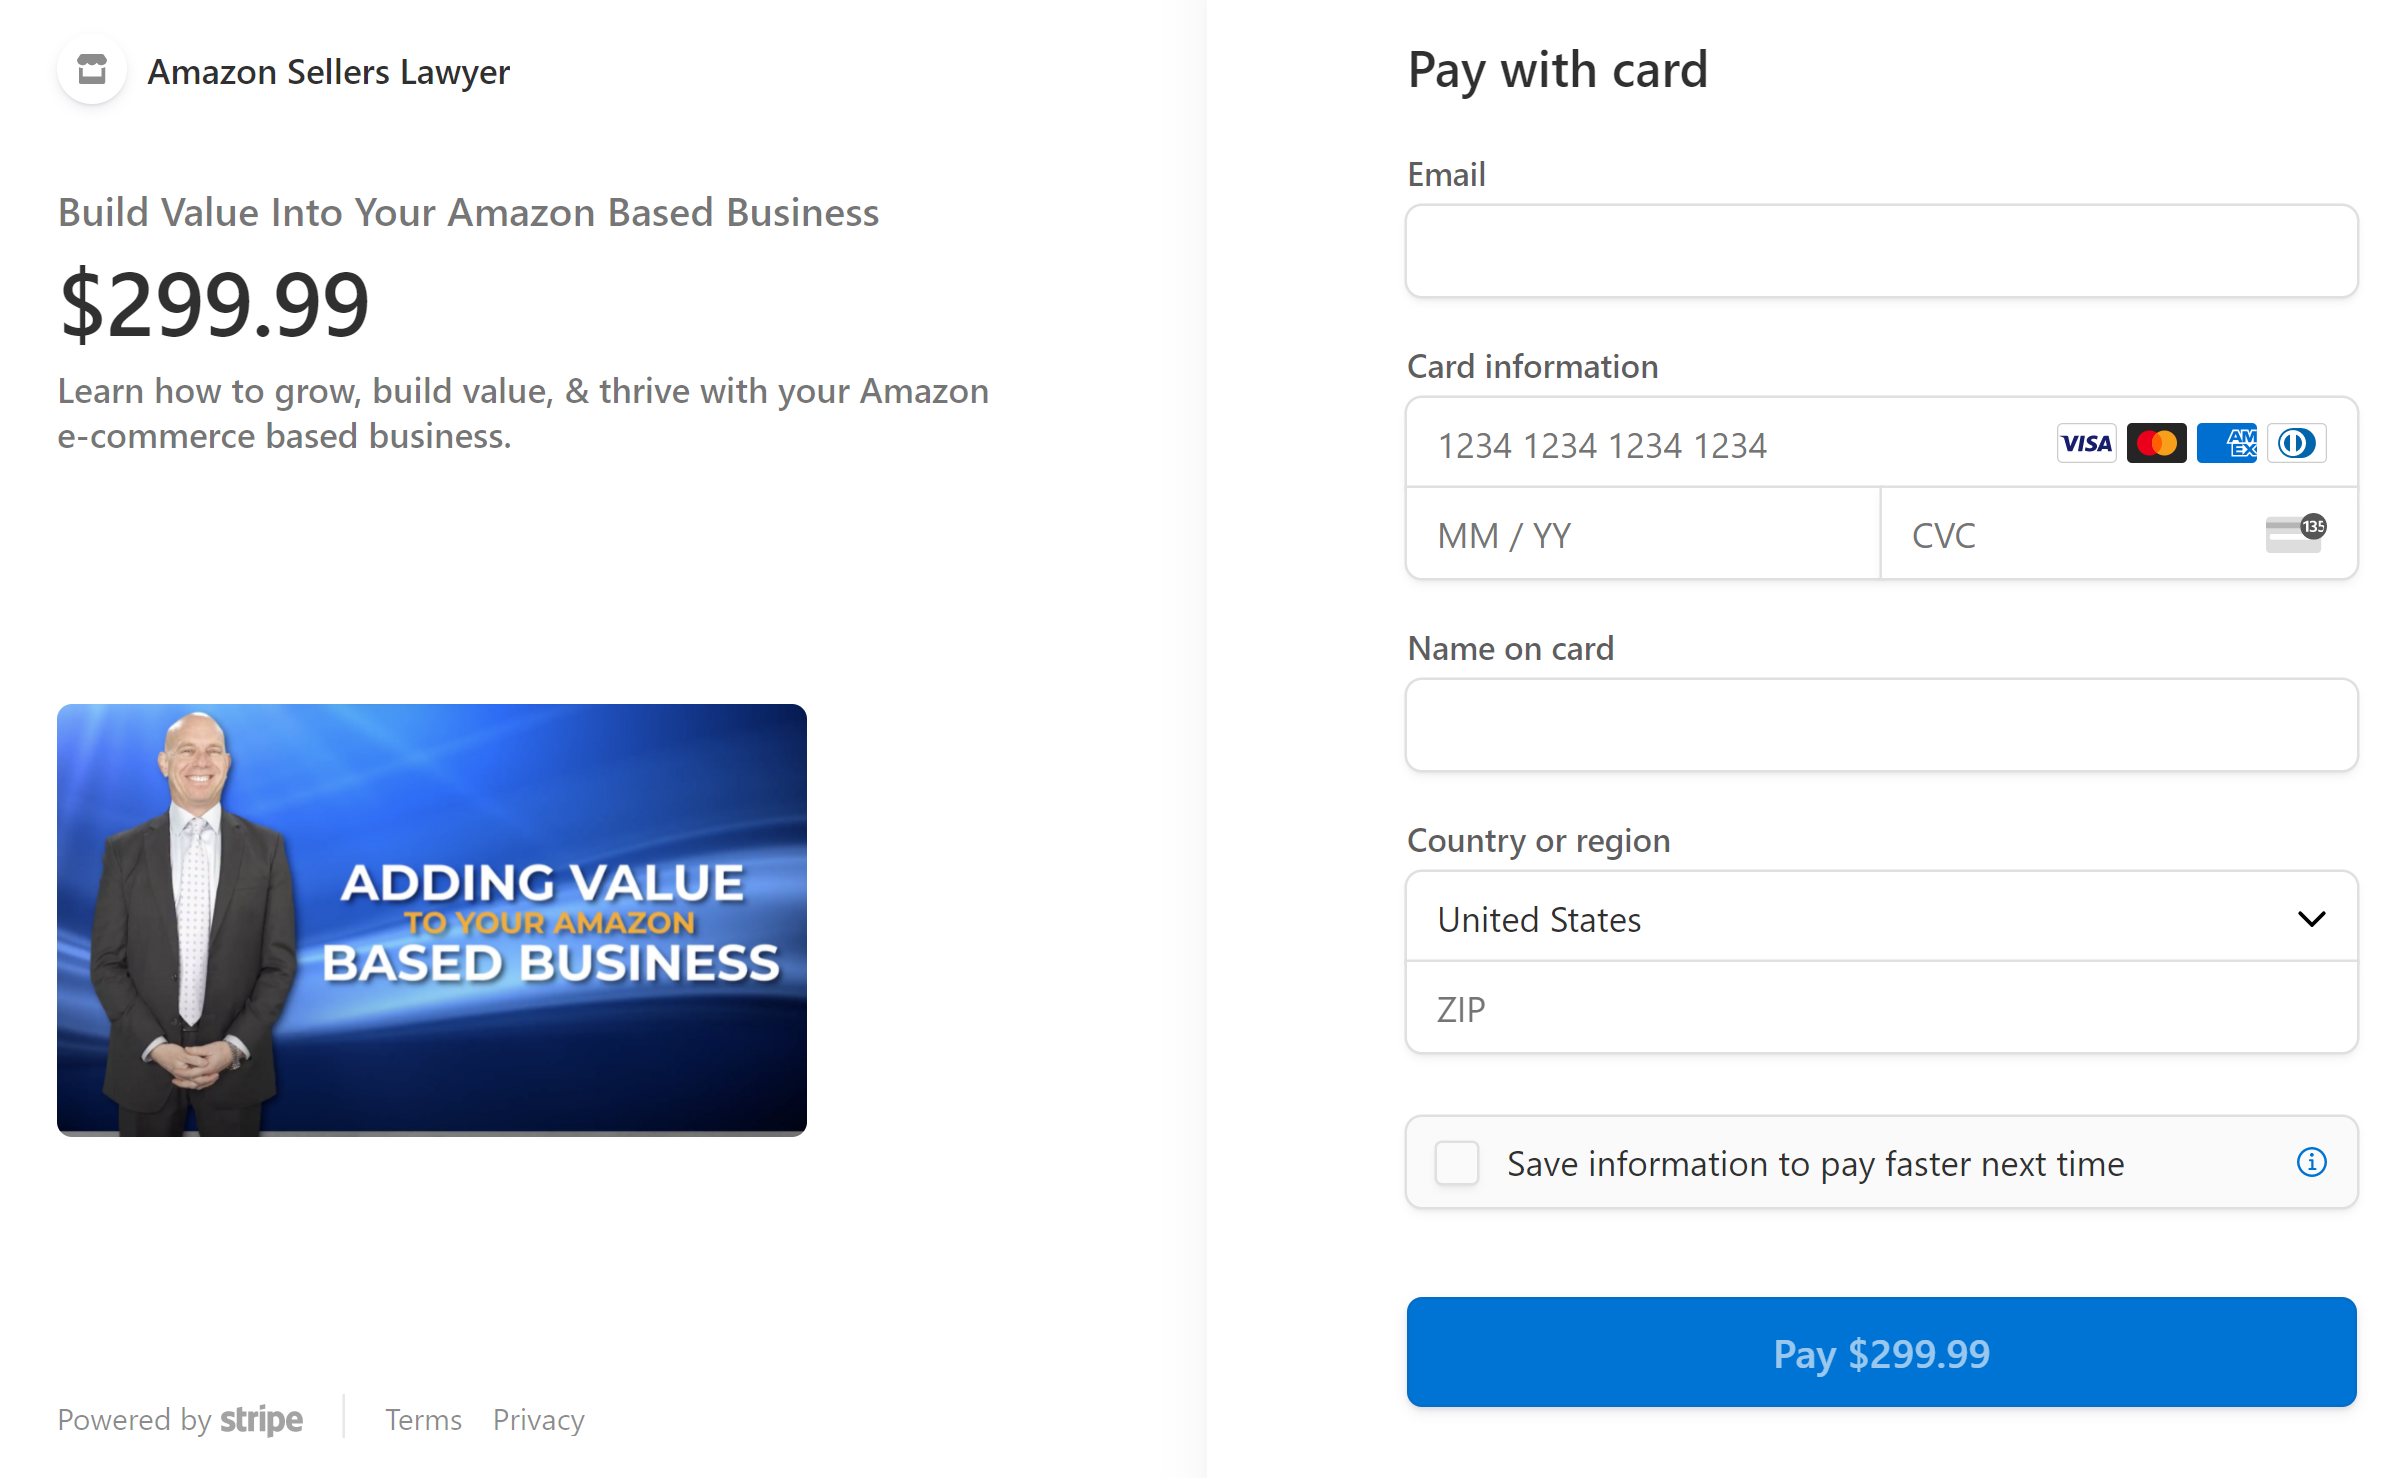 Build Value Into Amazon Business course payment